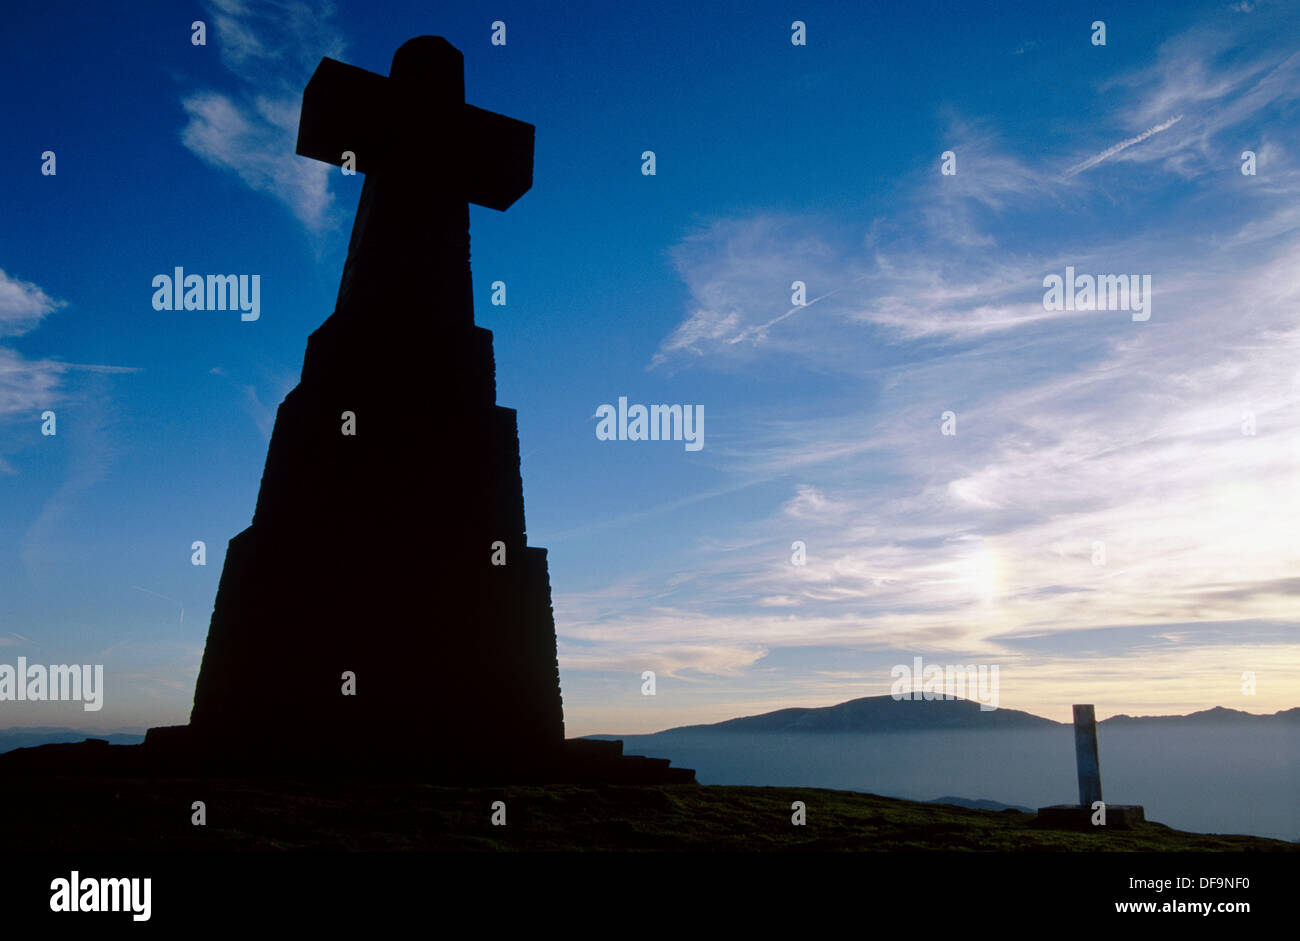 Ade Urkiola. Cima del Saibigain National Park. Vizcaya province. Spain. - Stock Image